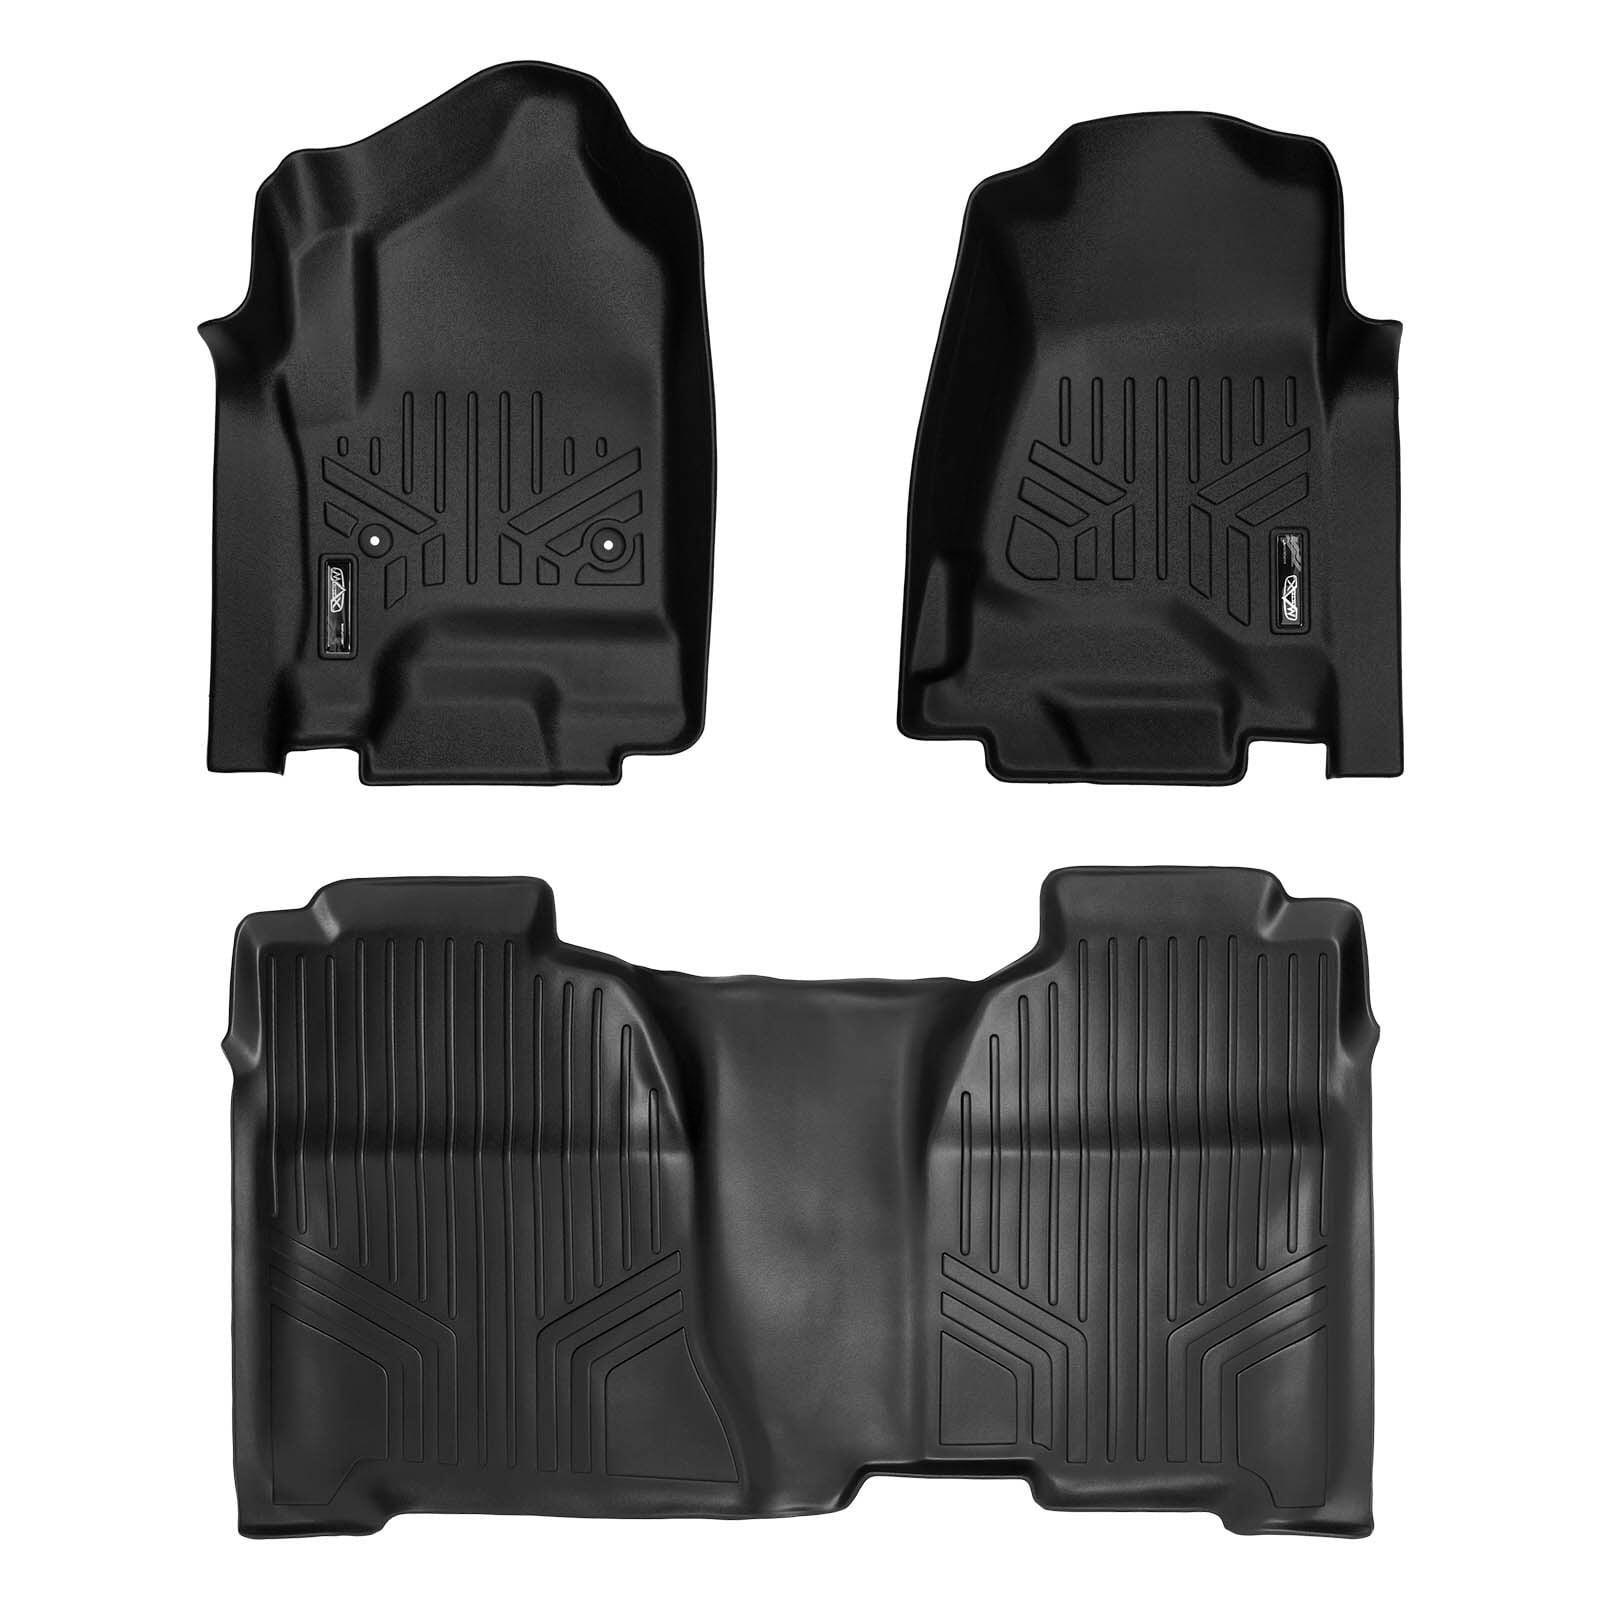 MAXFLOORMAT All Weather Custom Floor Mats Liner Set for Chevy CREW CAB (Black)